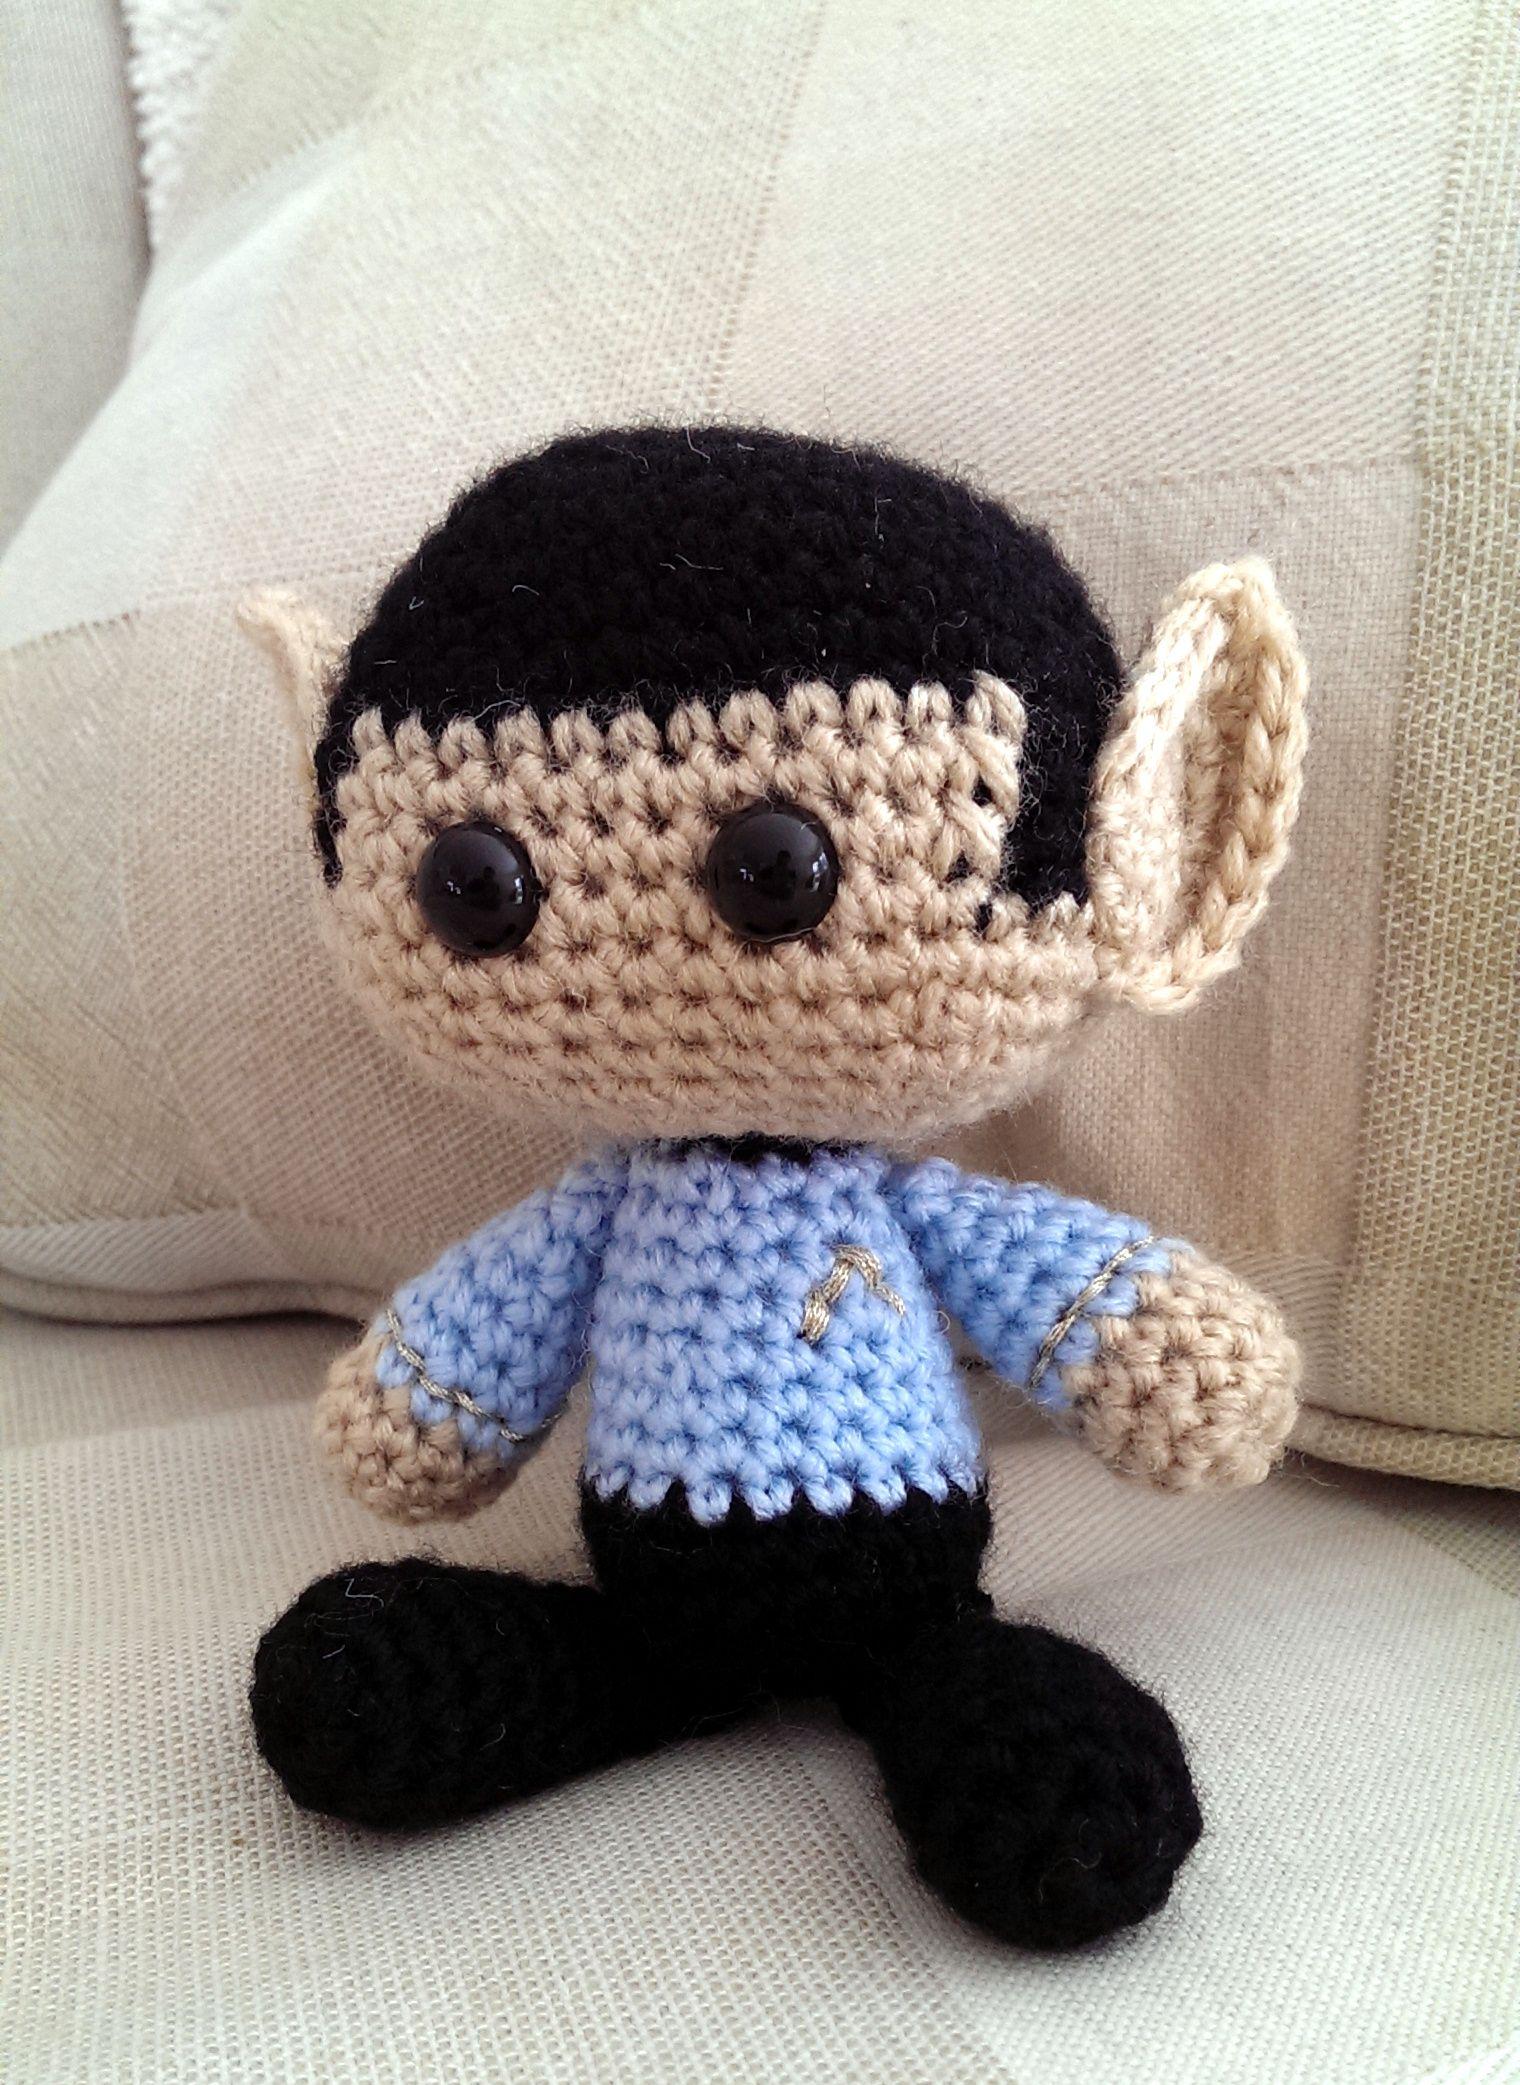 Crocheted Spock from Star Trek | Häkeln | Pinterest | Häkelideen ...